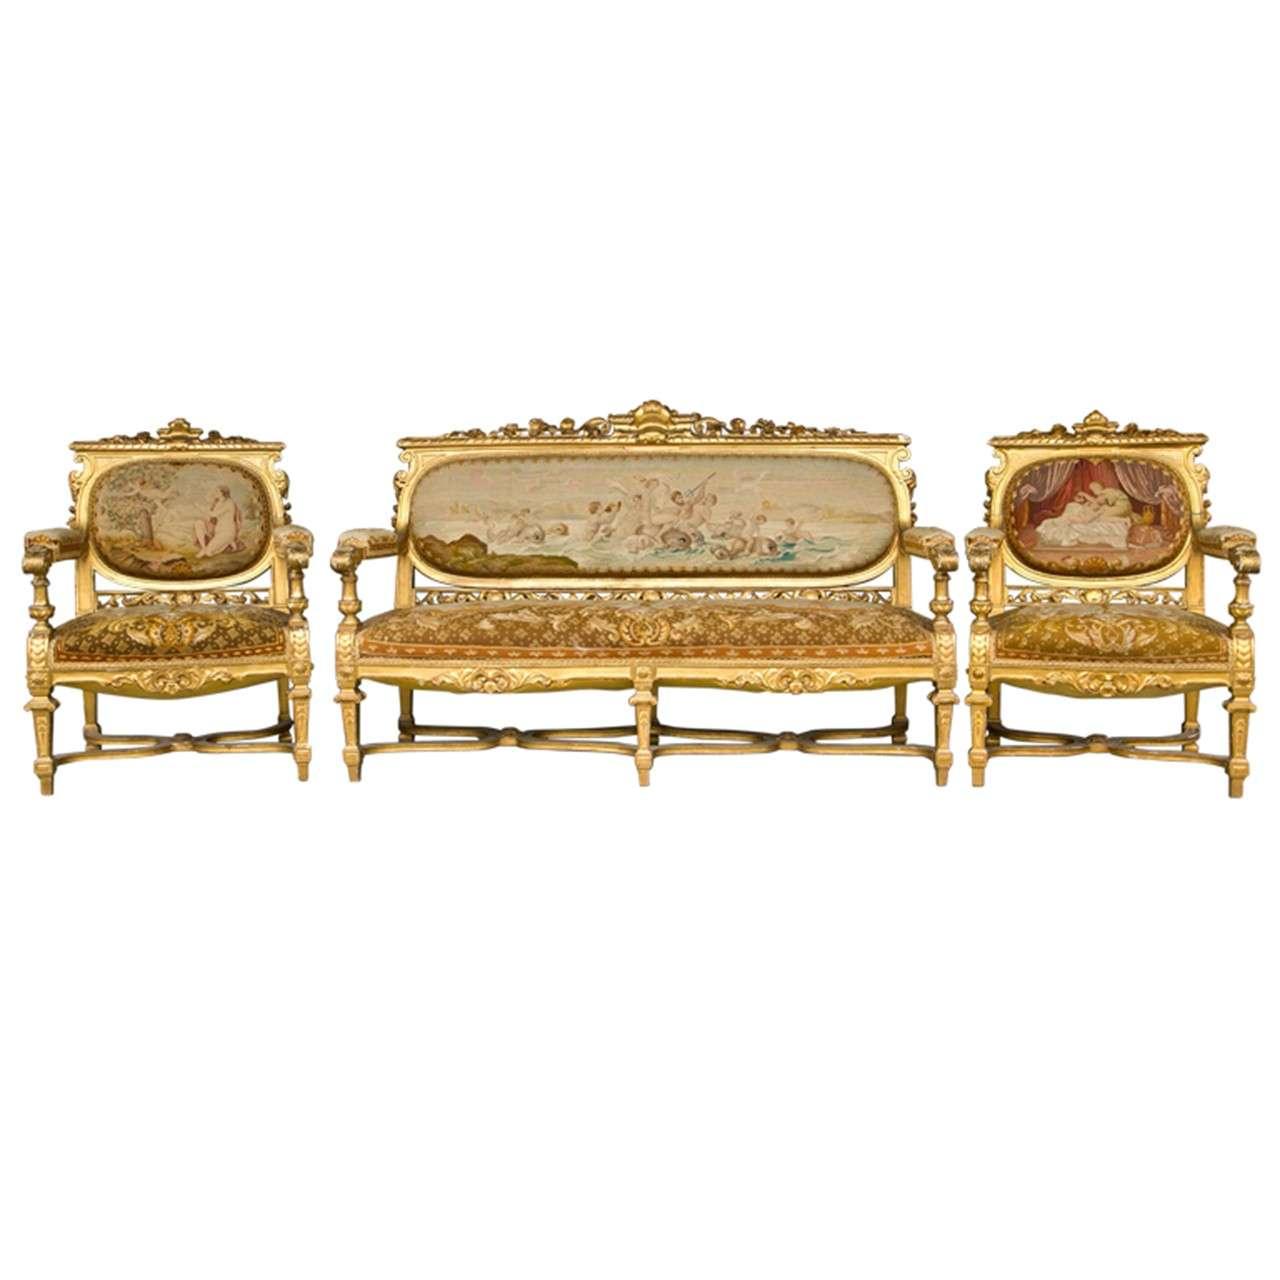 Louis XVI Style 3 Piece Gilded Salon Set 1Louis XVI Style 3 Piece Gilded Salon Set For Sale at 1stdibs. Louis Xvi Style Furniture For Sale. Home Design Ideas